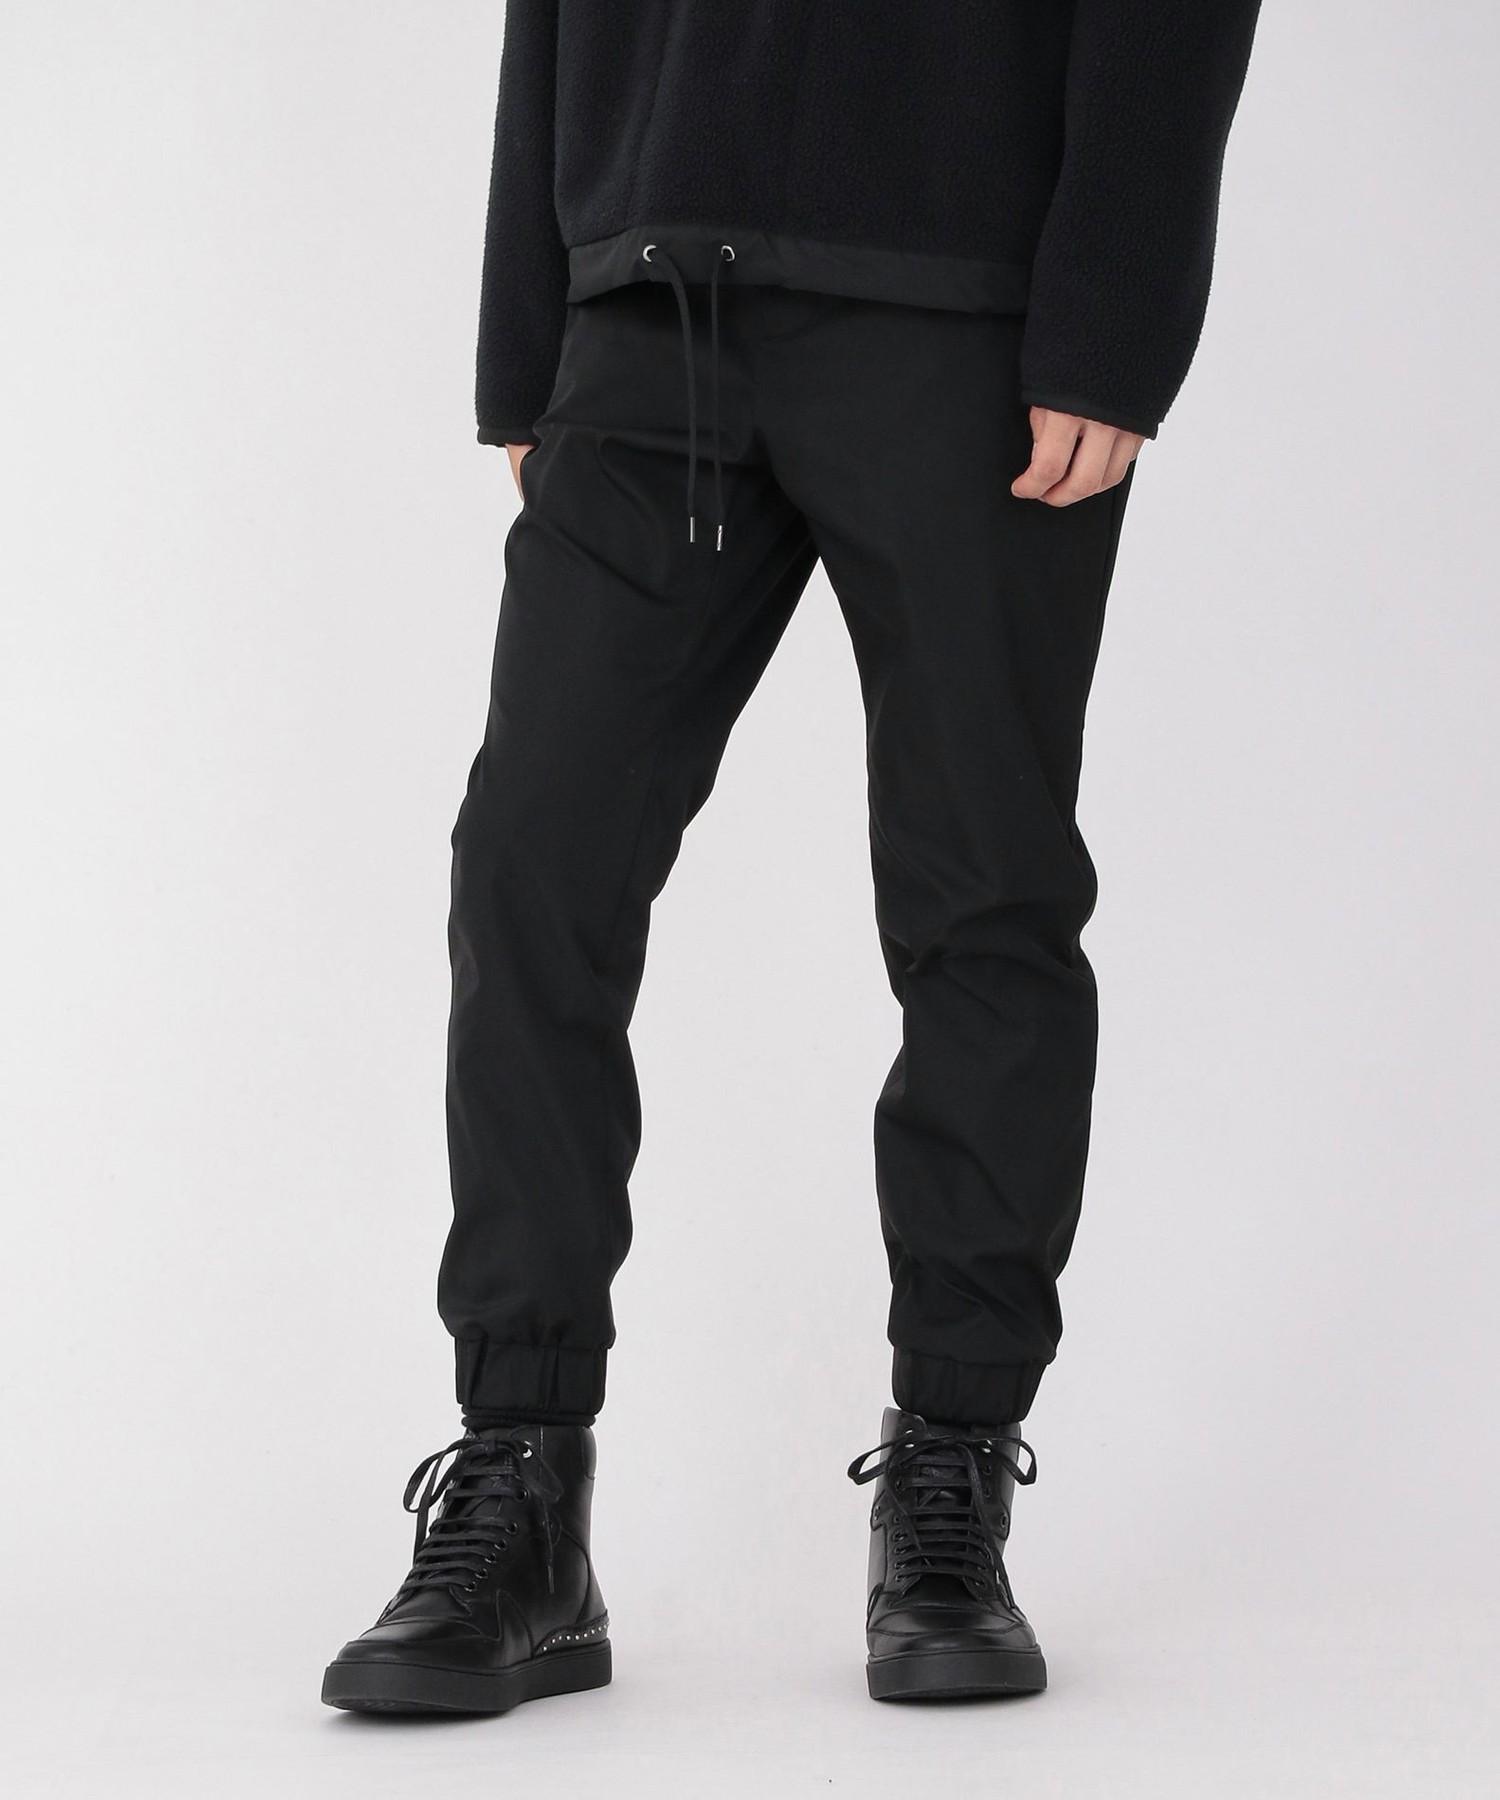 Japanese straight hair, European and American simple straight elastic pants, comfortable sports leisure pants, jogging pants